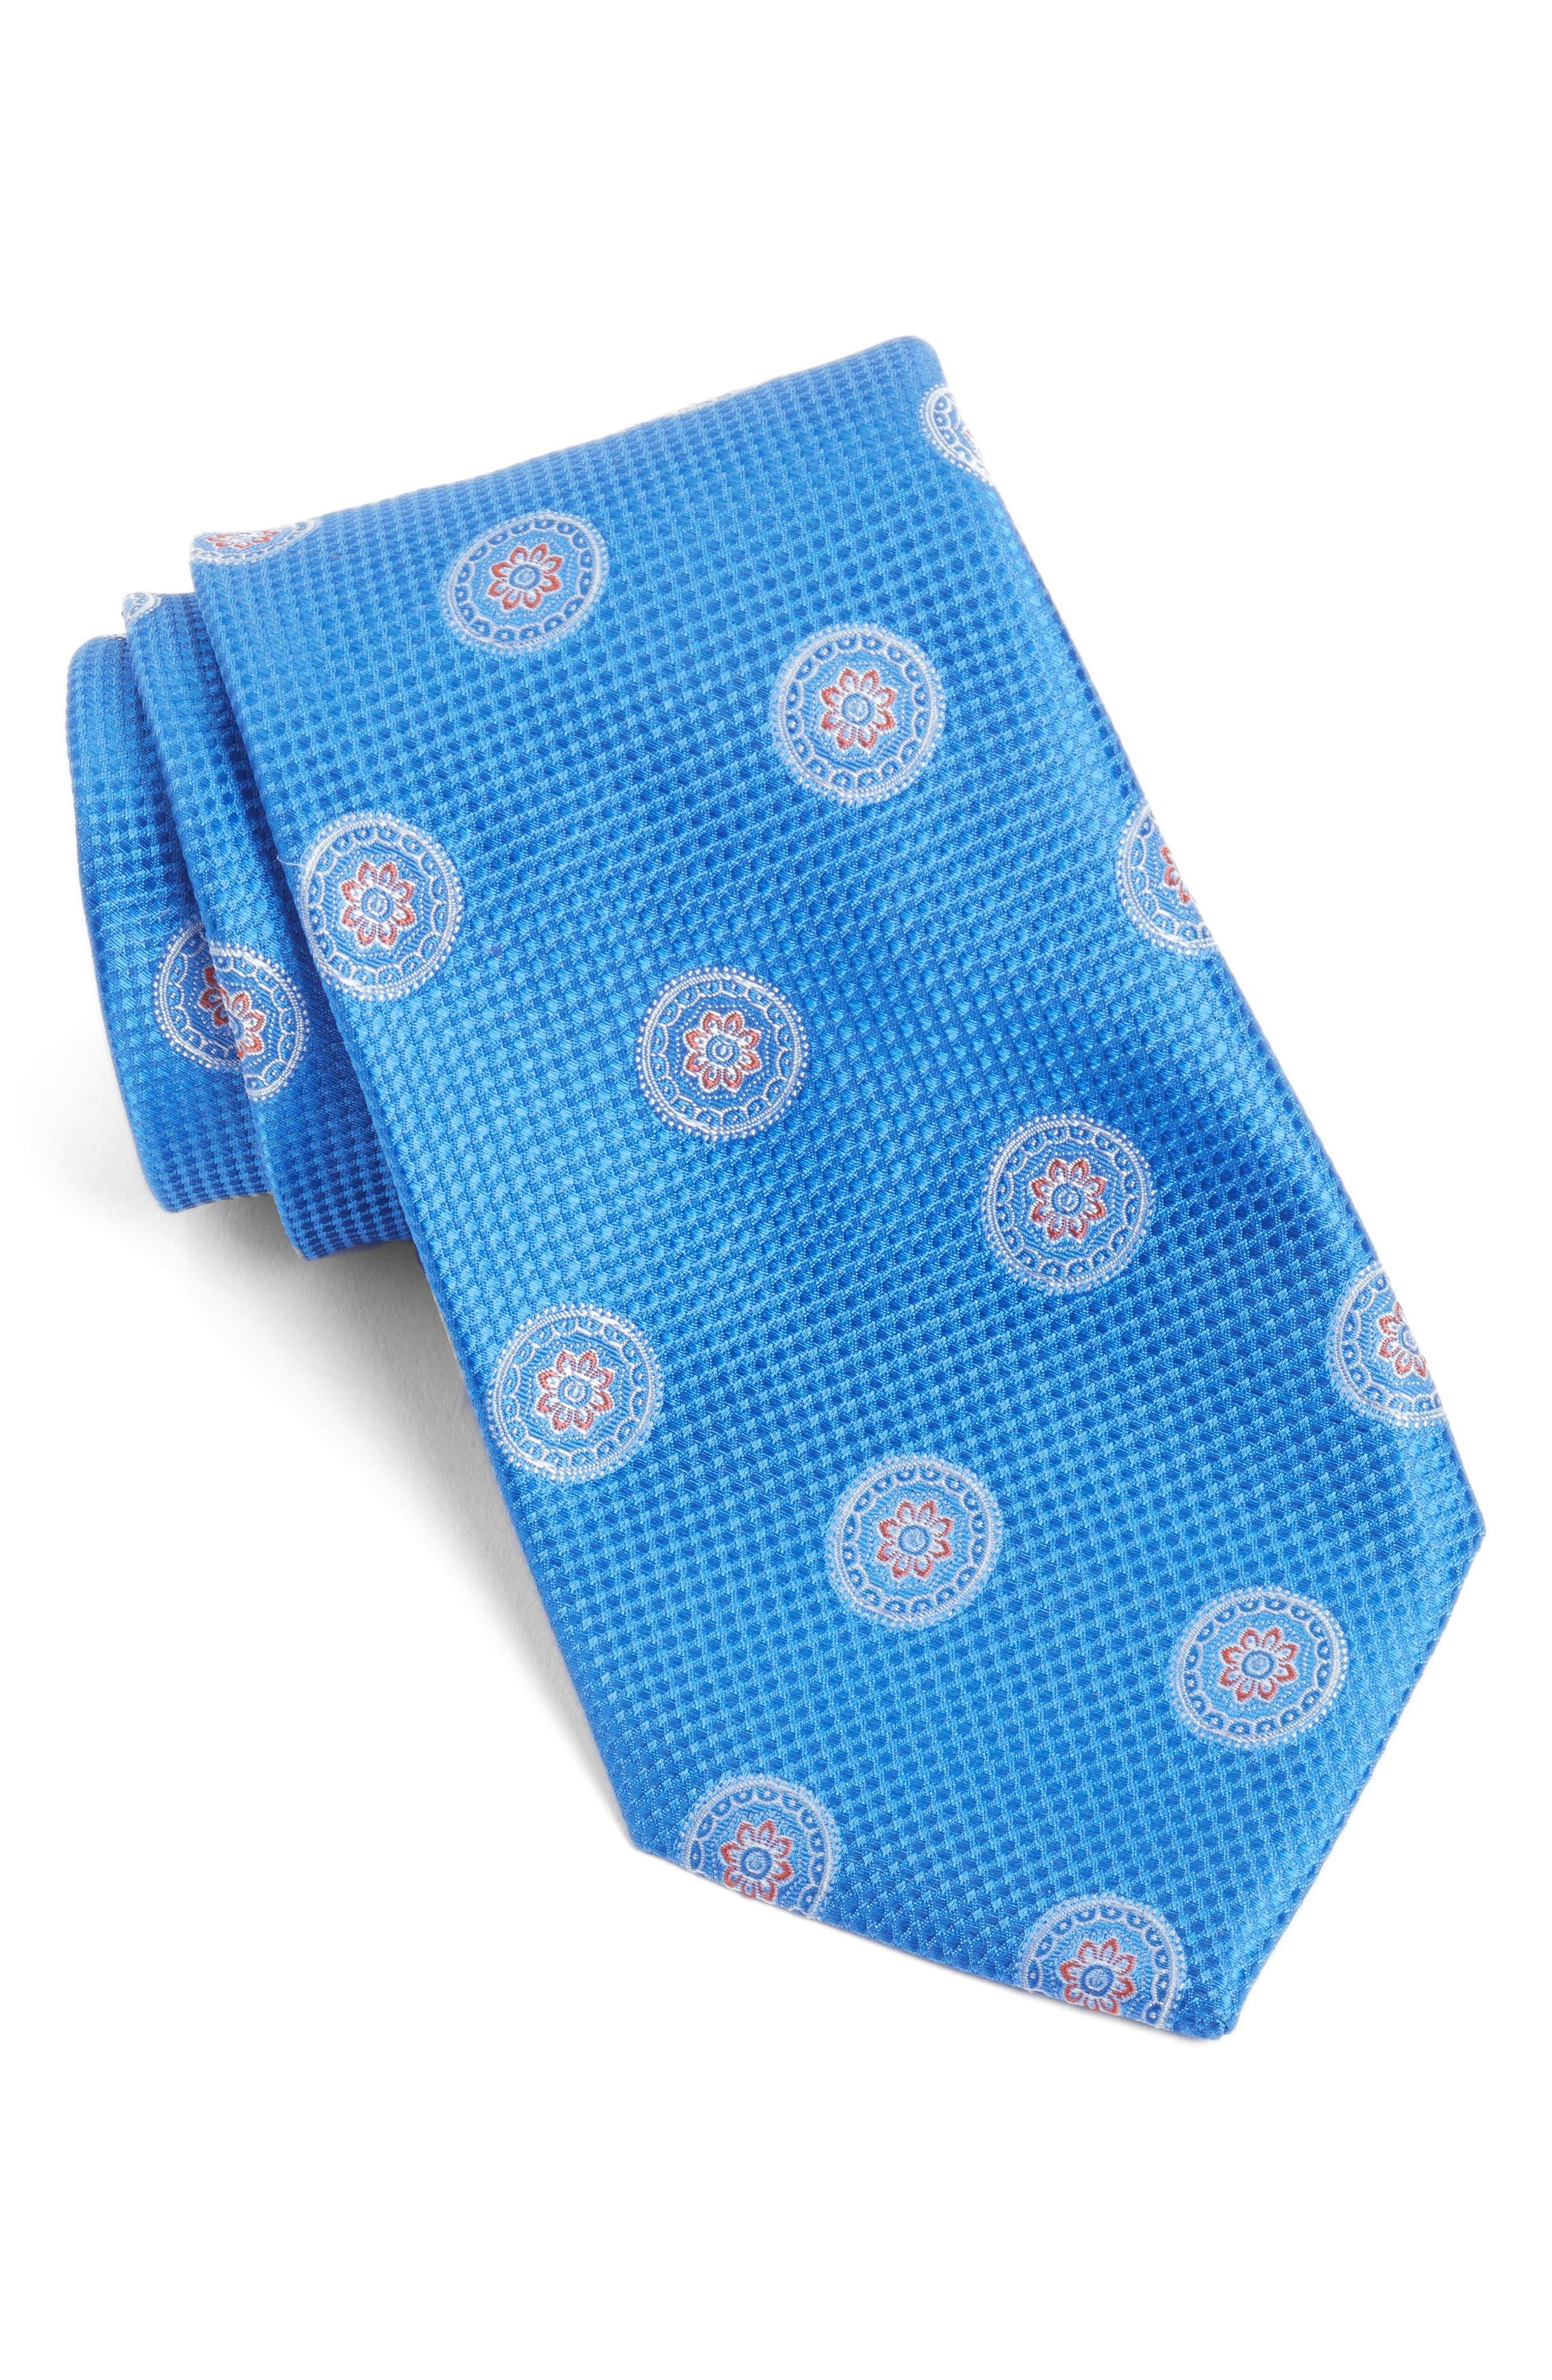 Main Image - Nordstrom Men's Shop Circular Medallion Silk Tie